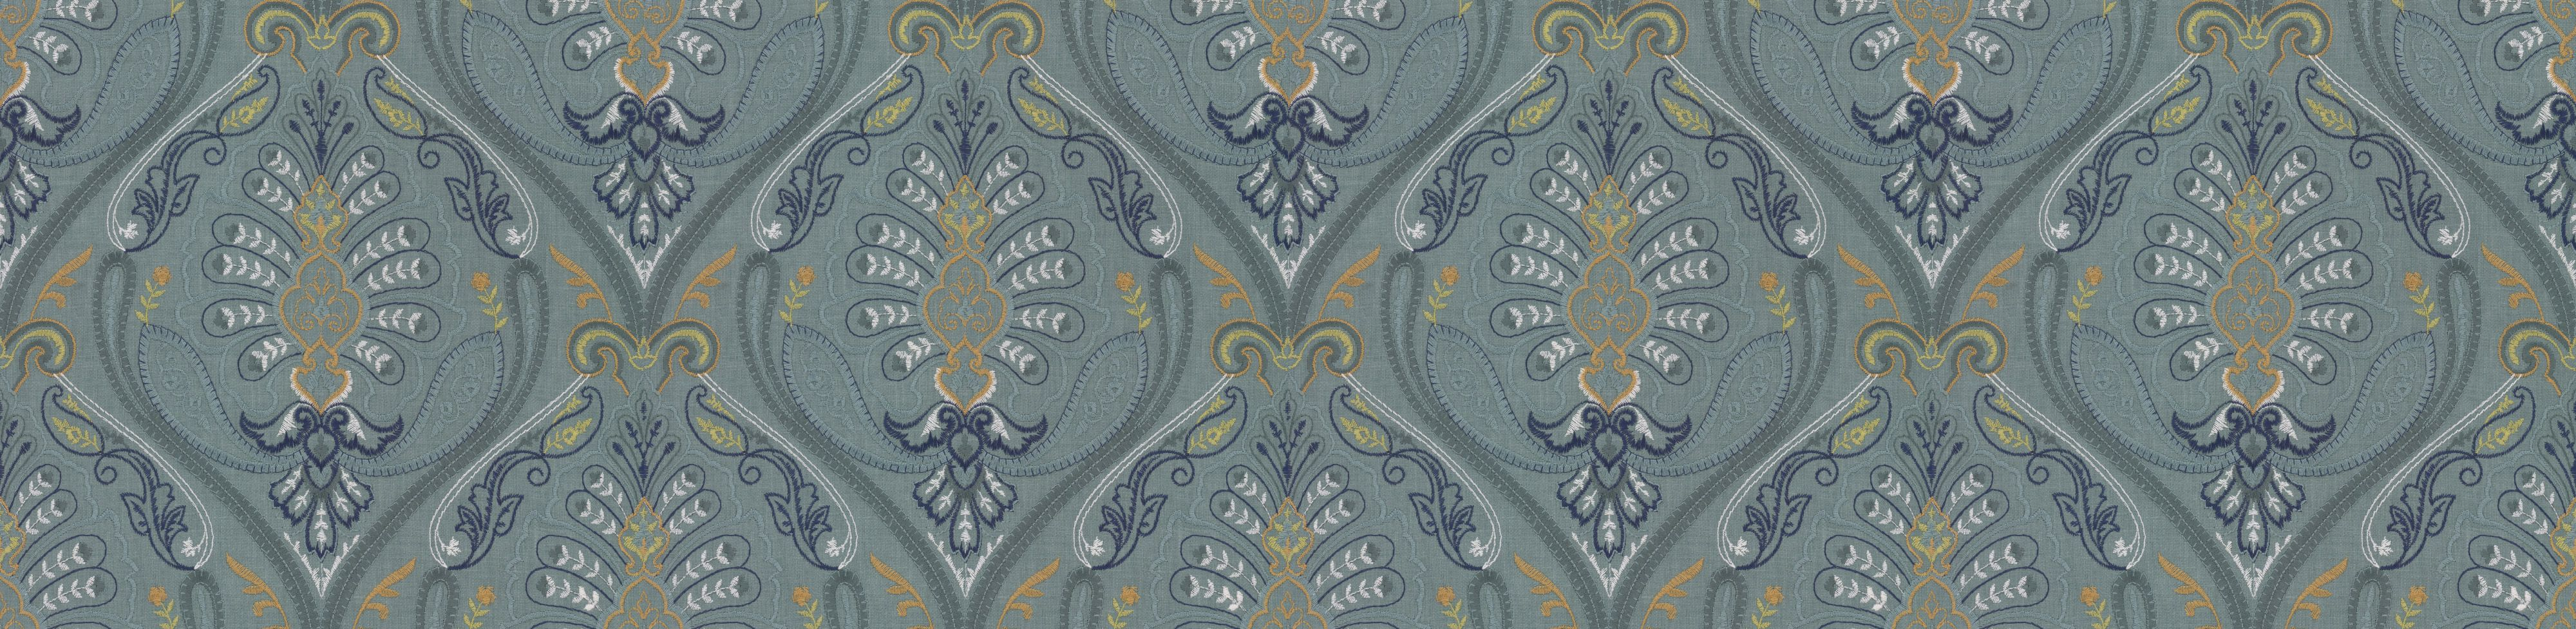 St Kitts Fabric - Lagoon - by Prestigious